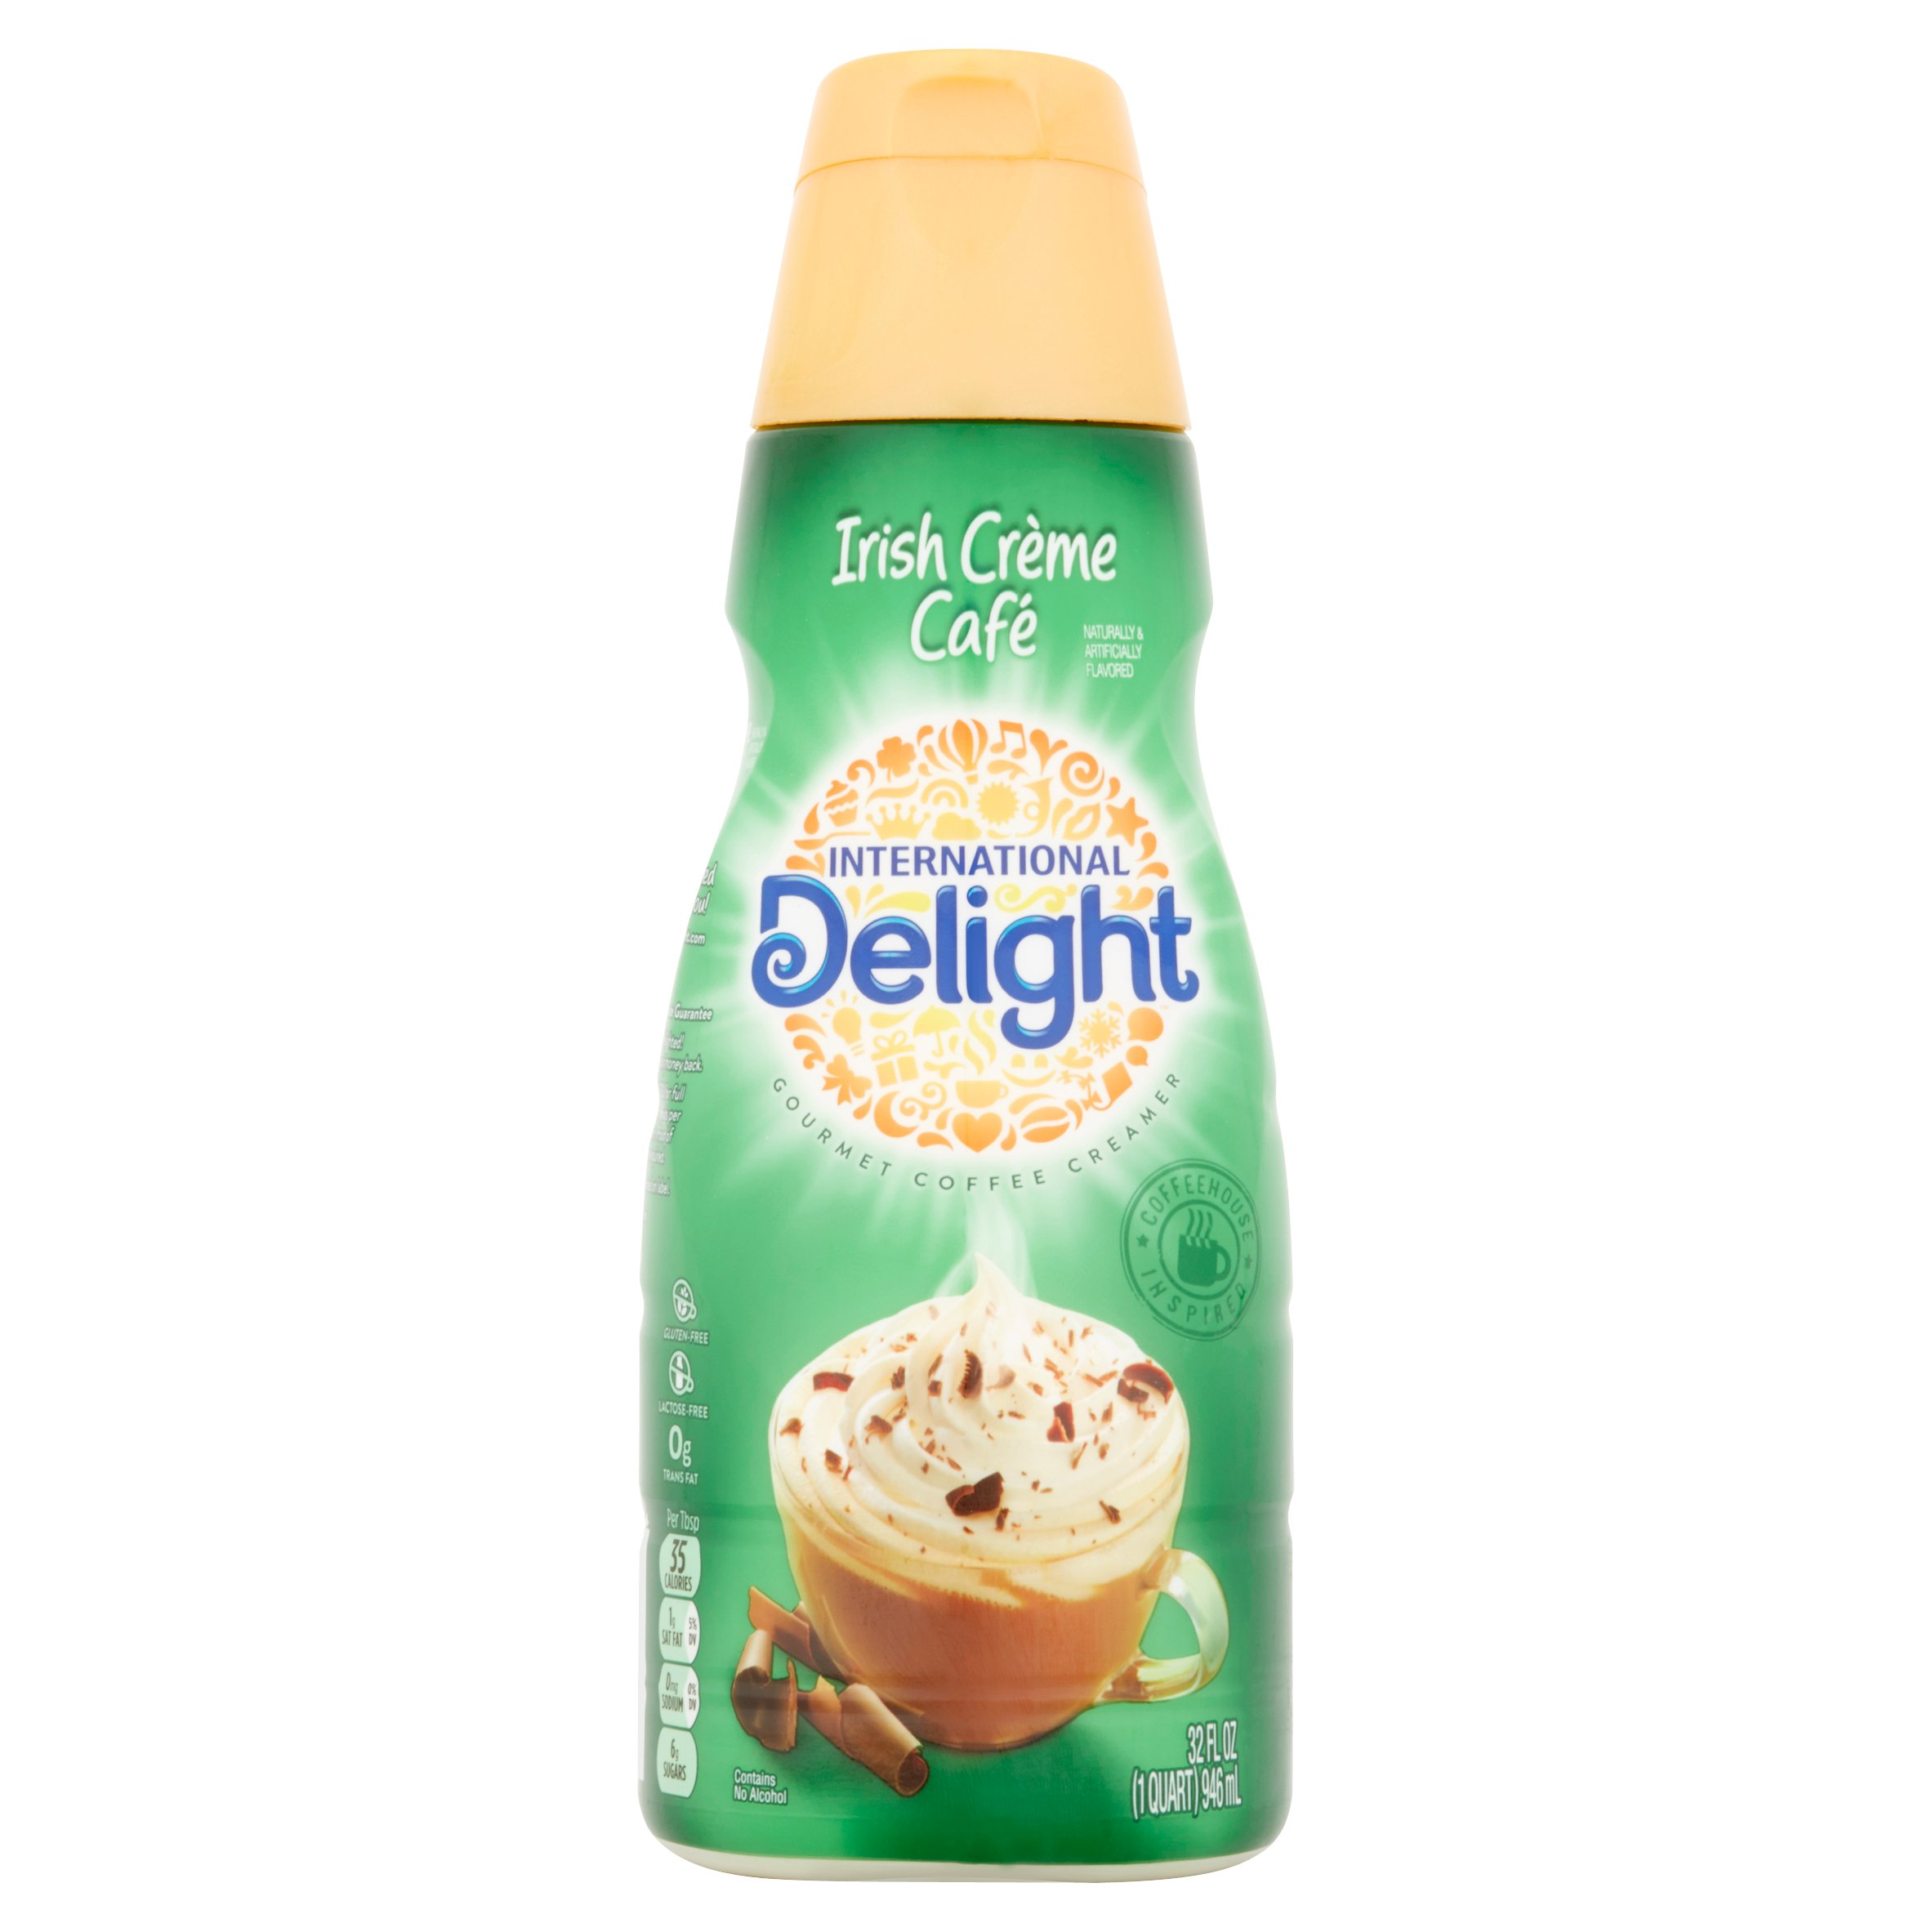 International Delight, Irish Creme Coffee Creamer, 1 Quart